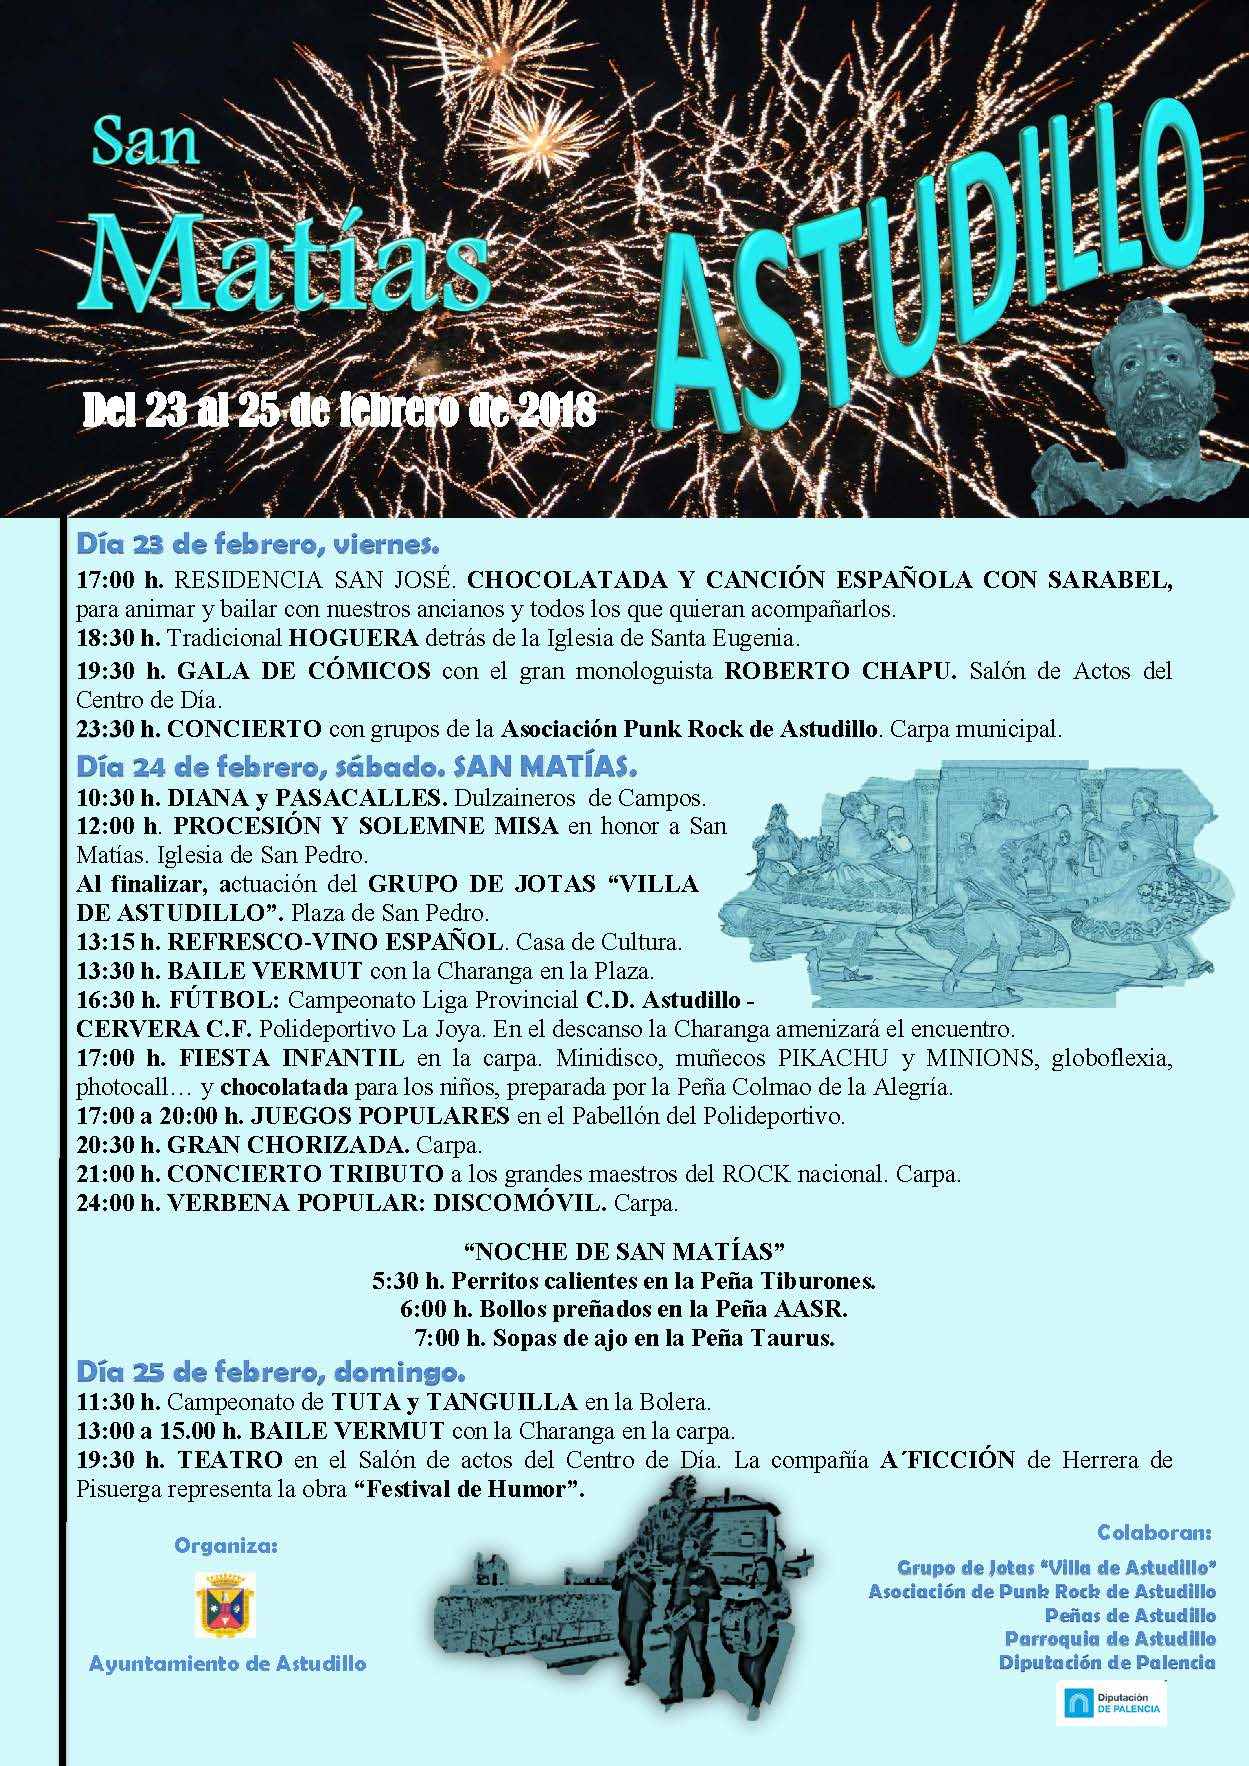 San Matías, del 23 al 25 de Febrero de 2018